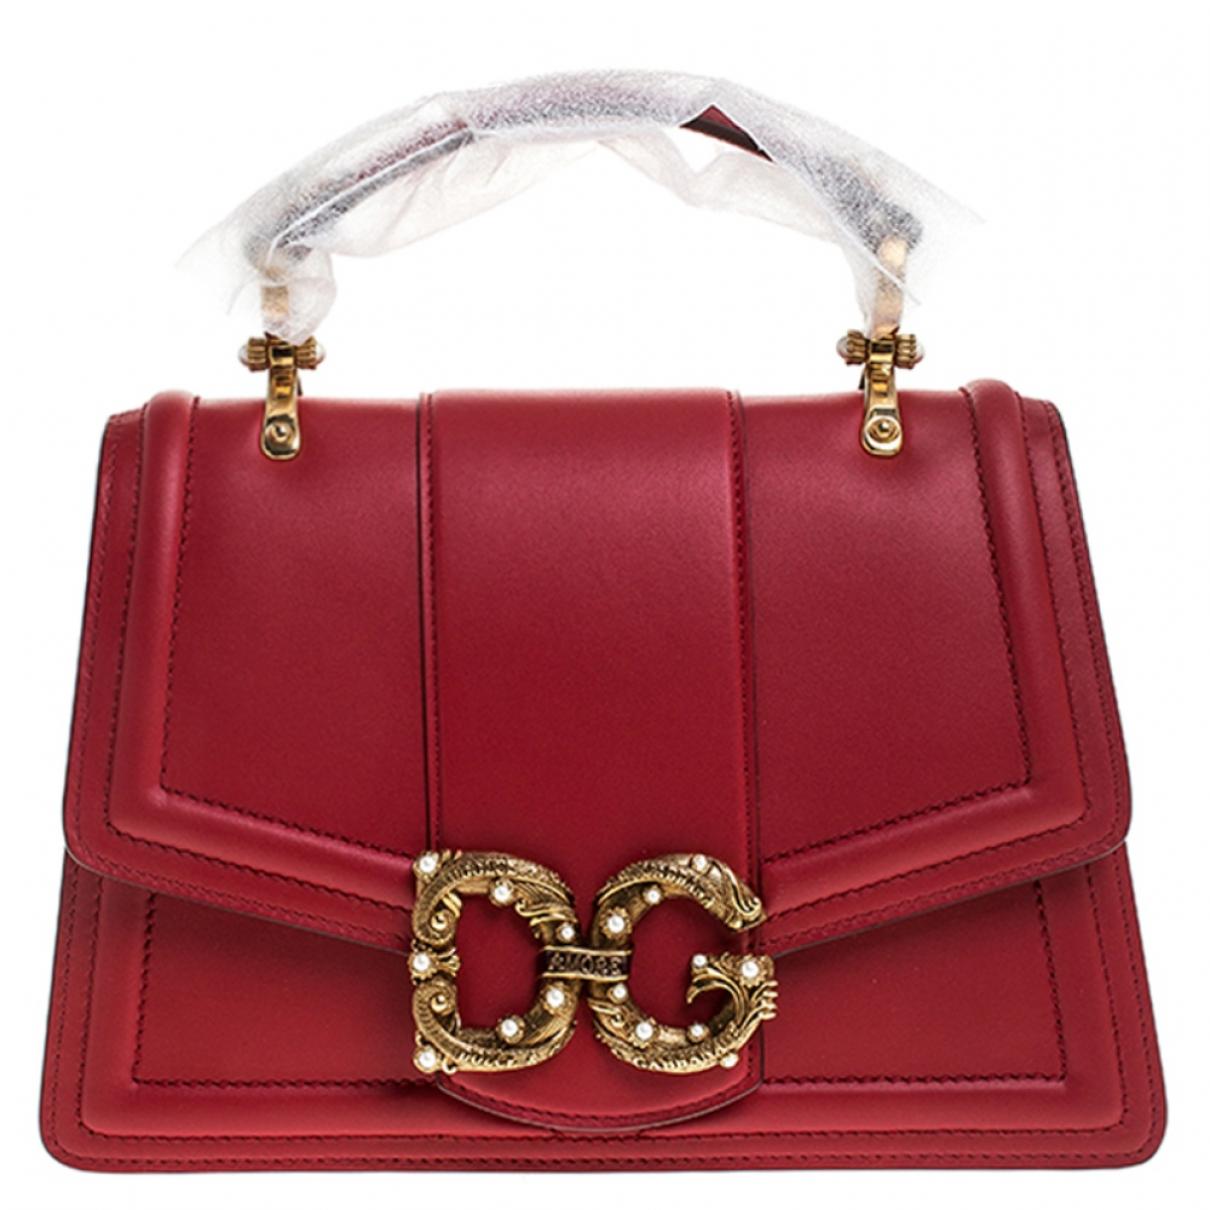 Dolce & Gabbana DG Amore Red Leather handbag for Women \N